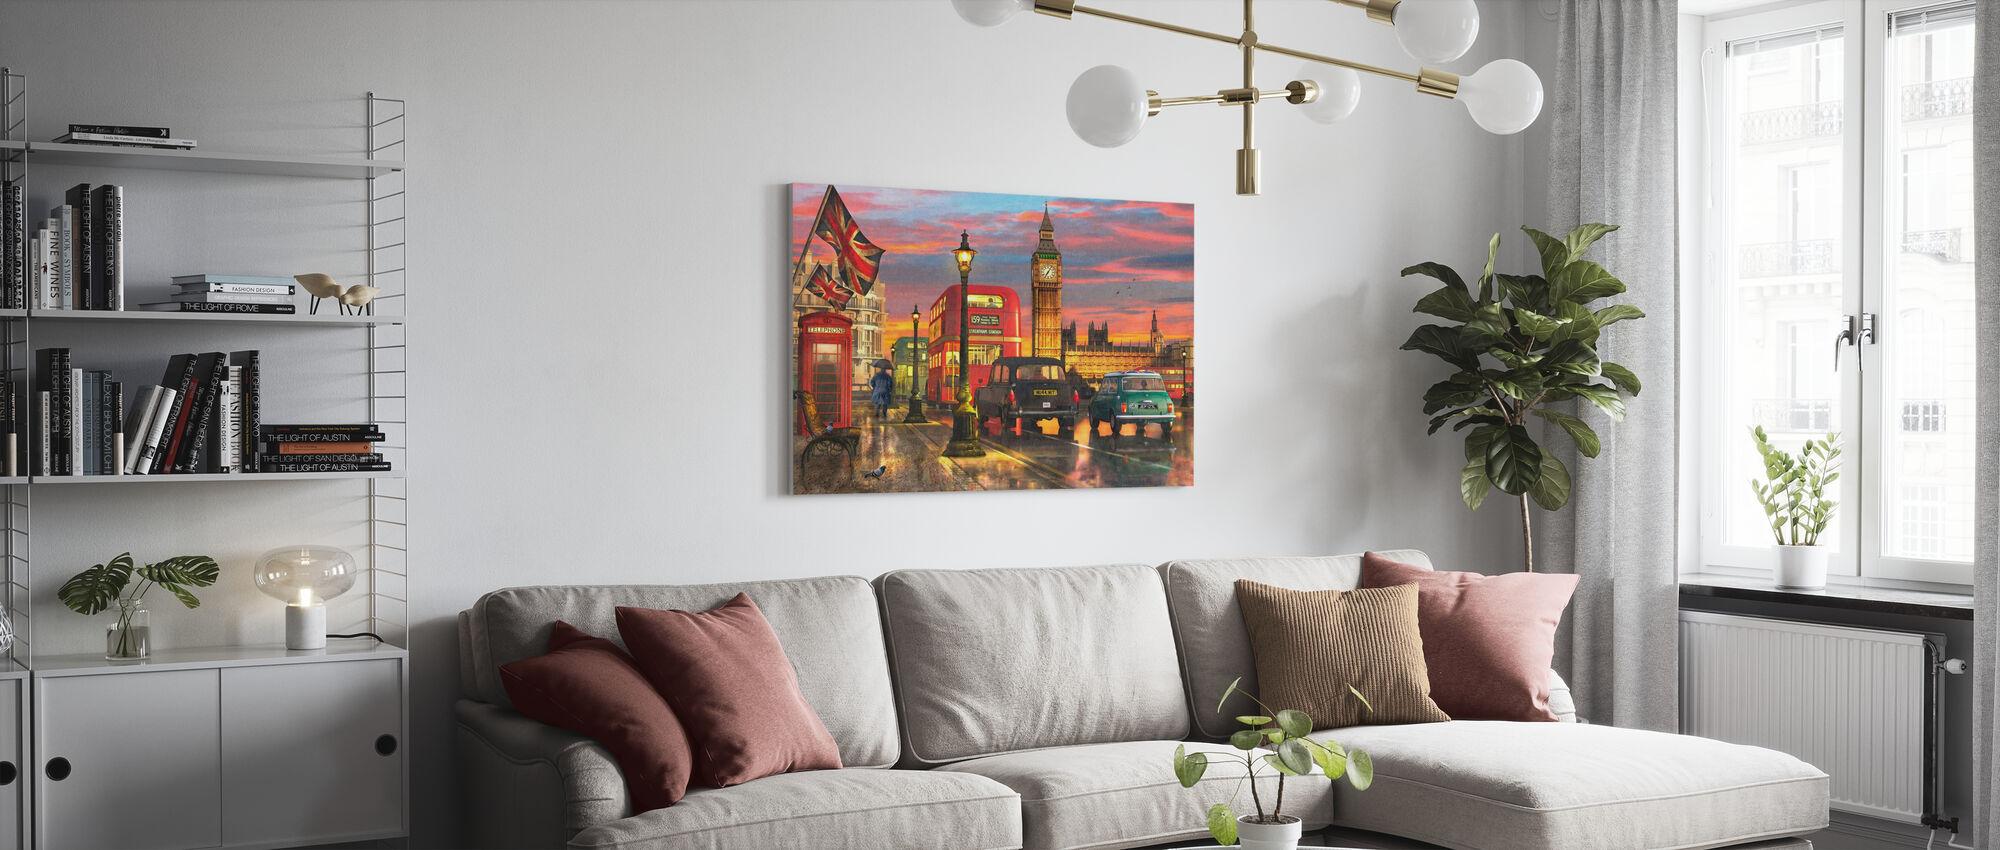 Raining Parliament Square - Canvas print - Living Room